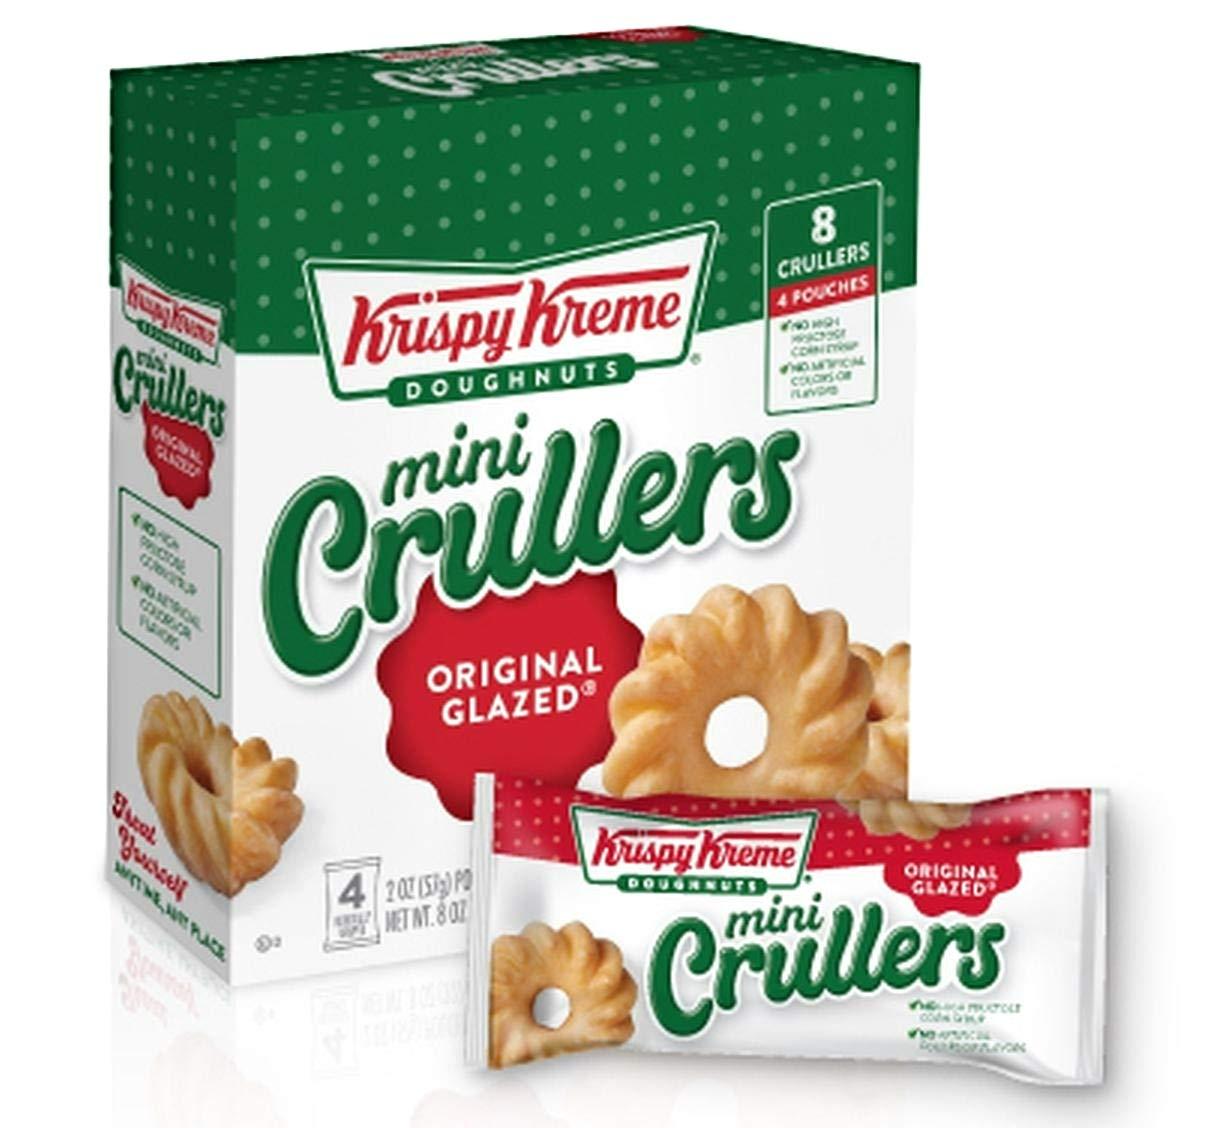 Krispy Kreme Mini Crullers (Original Glazed, 8oz)